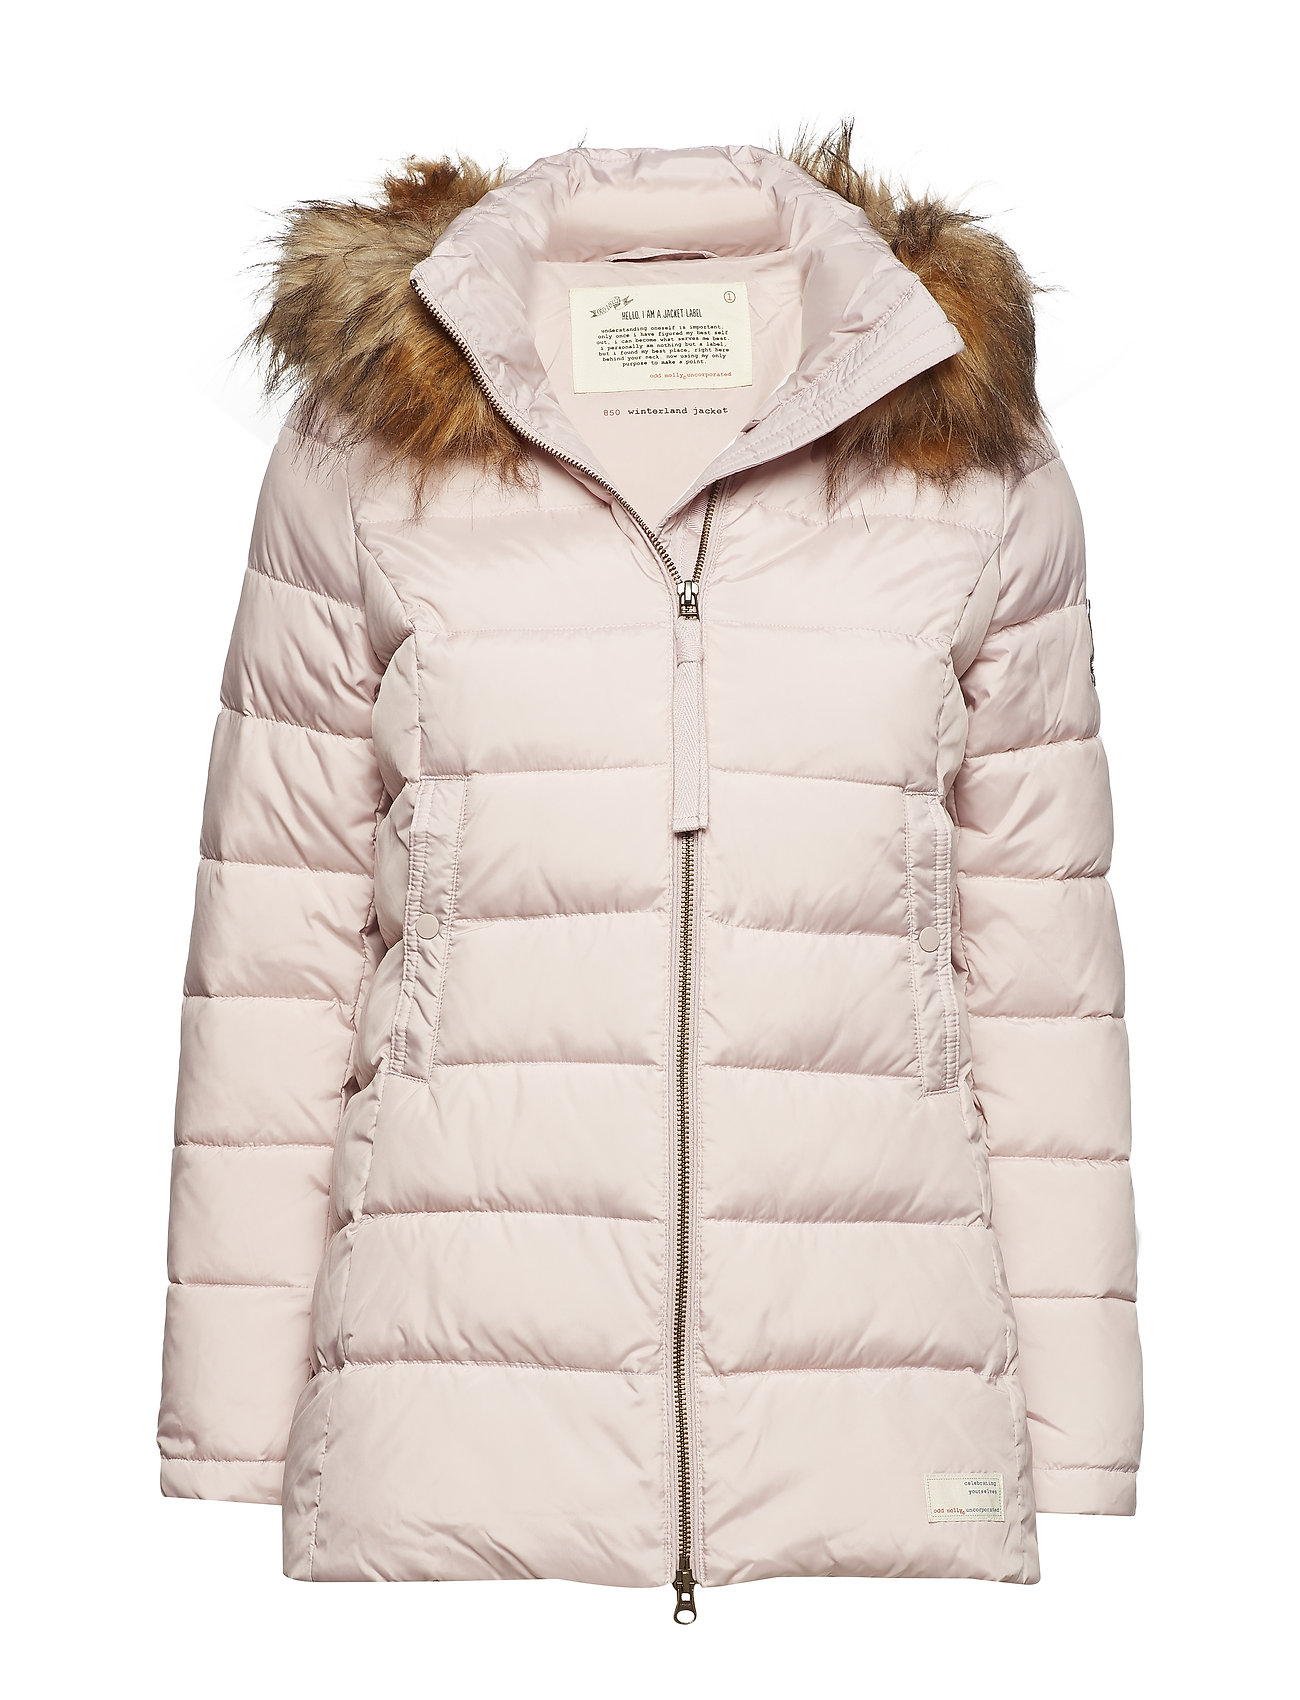 ODD MOLLY winterland jacket - PINK EARTH